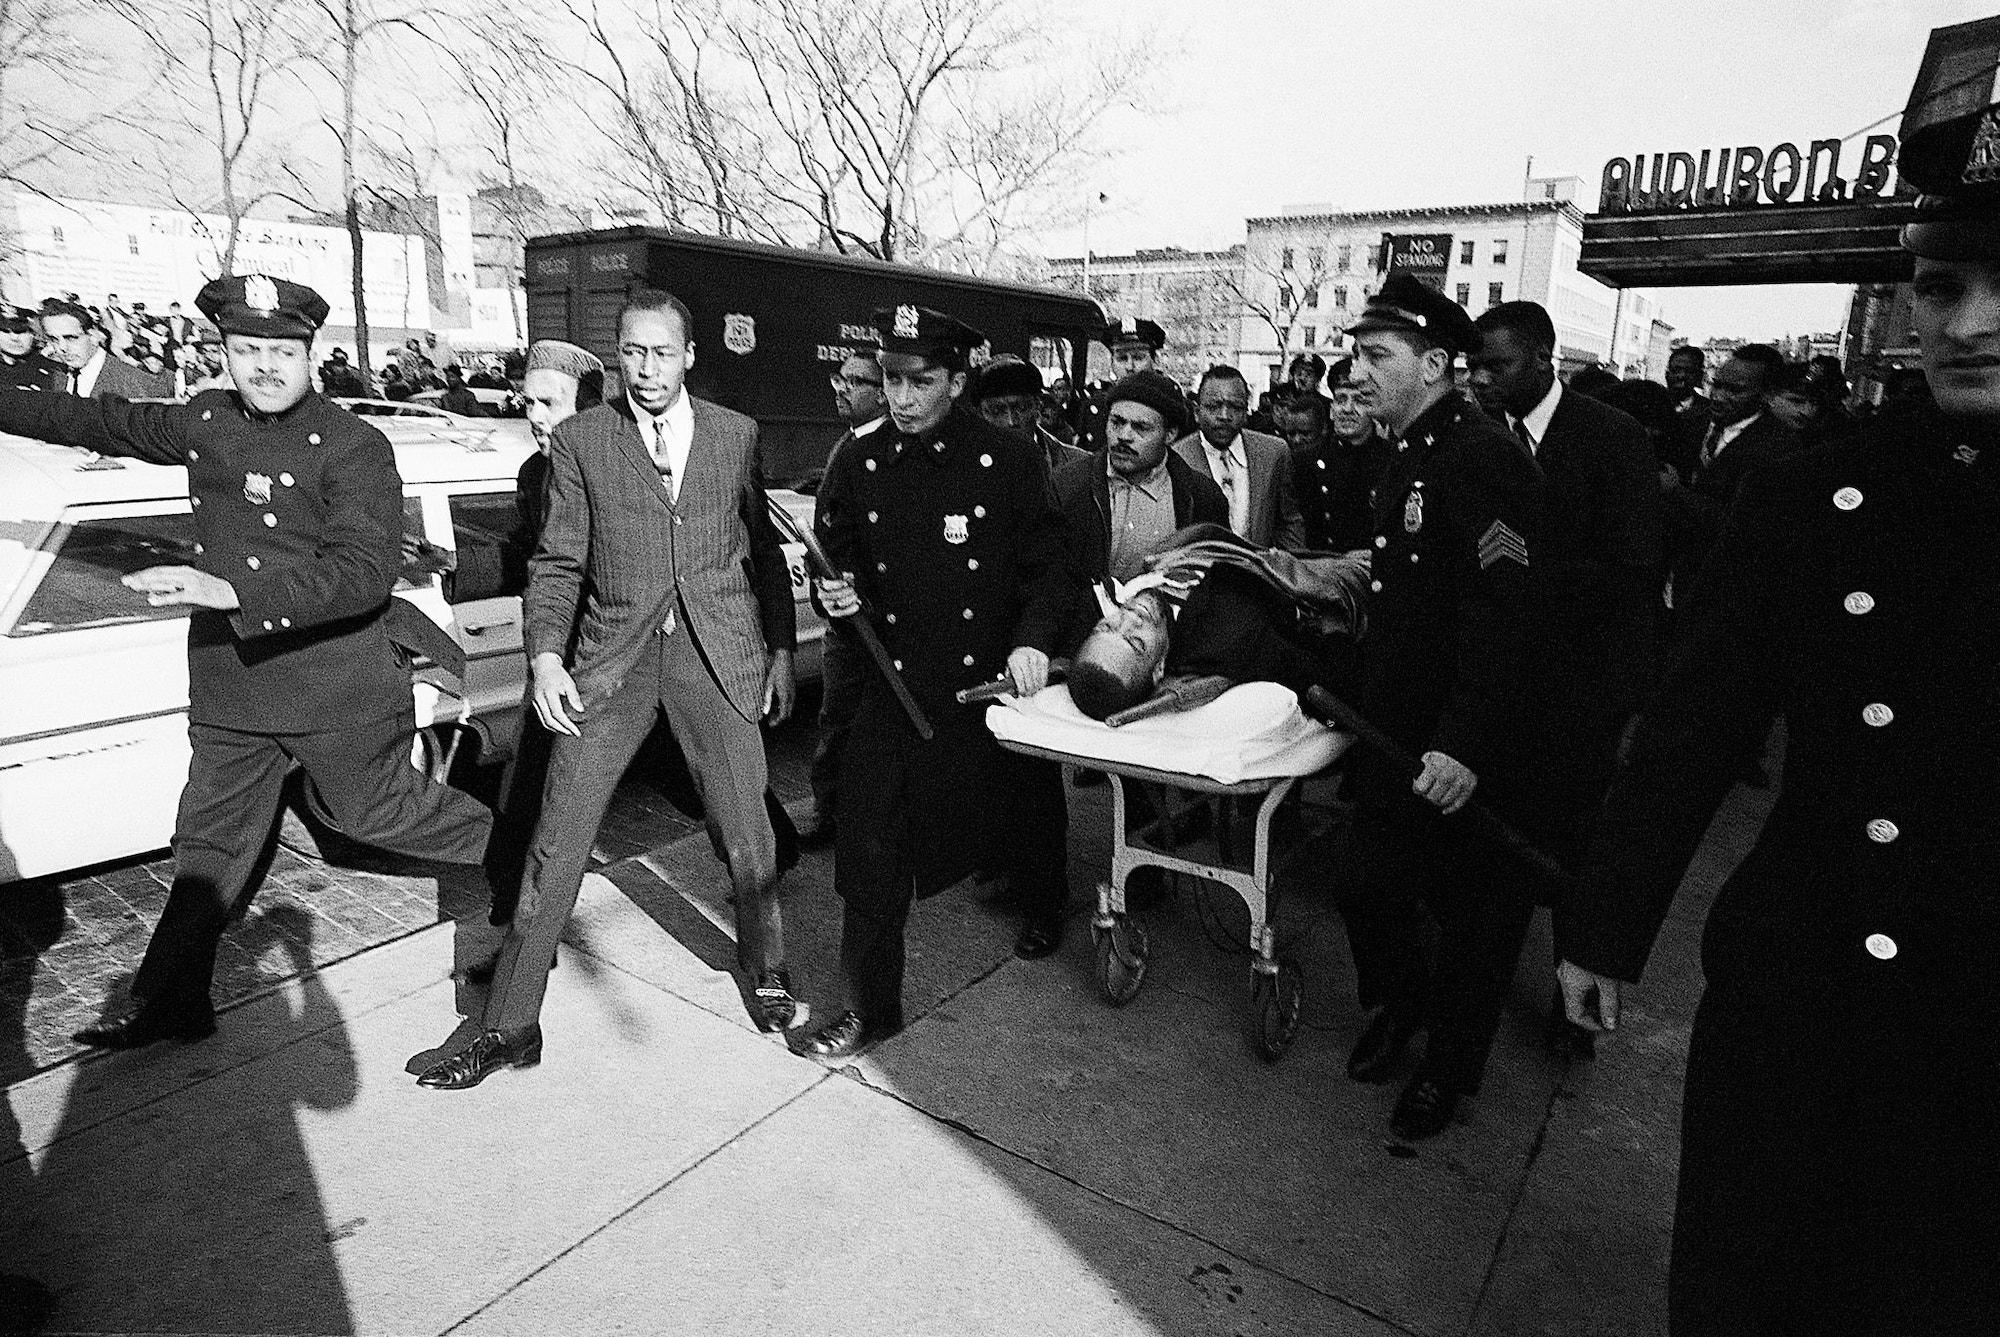 Malcolm X, El-Hajj Malik El-Shabazz, Chicago Red, African American History, Black History, African American Activist, Black Activist, Civil Rights, KOLUMN Magazine, KOLUMN, KINDR'D Magazine, KINDR'D, Willoughby Avenue, Wriit,